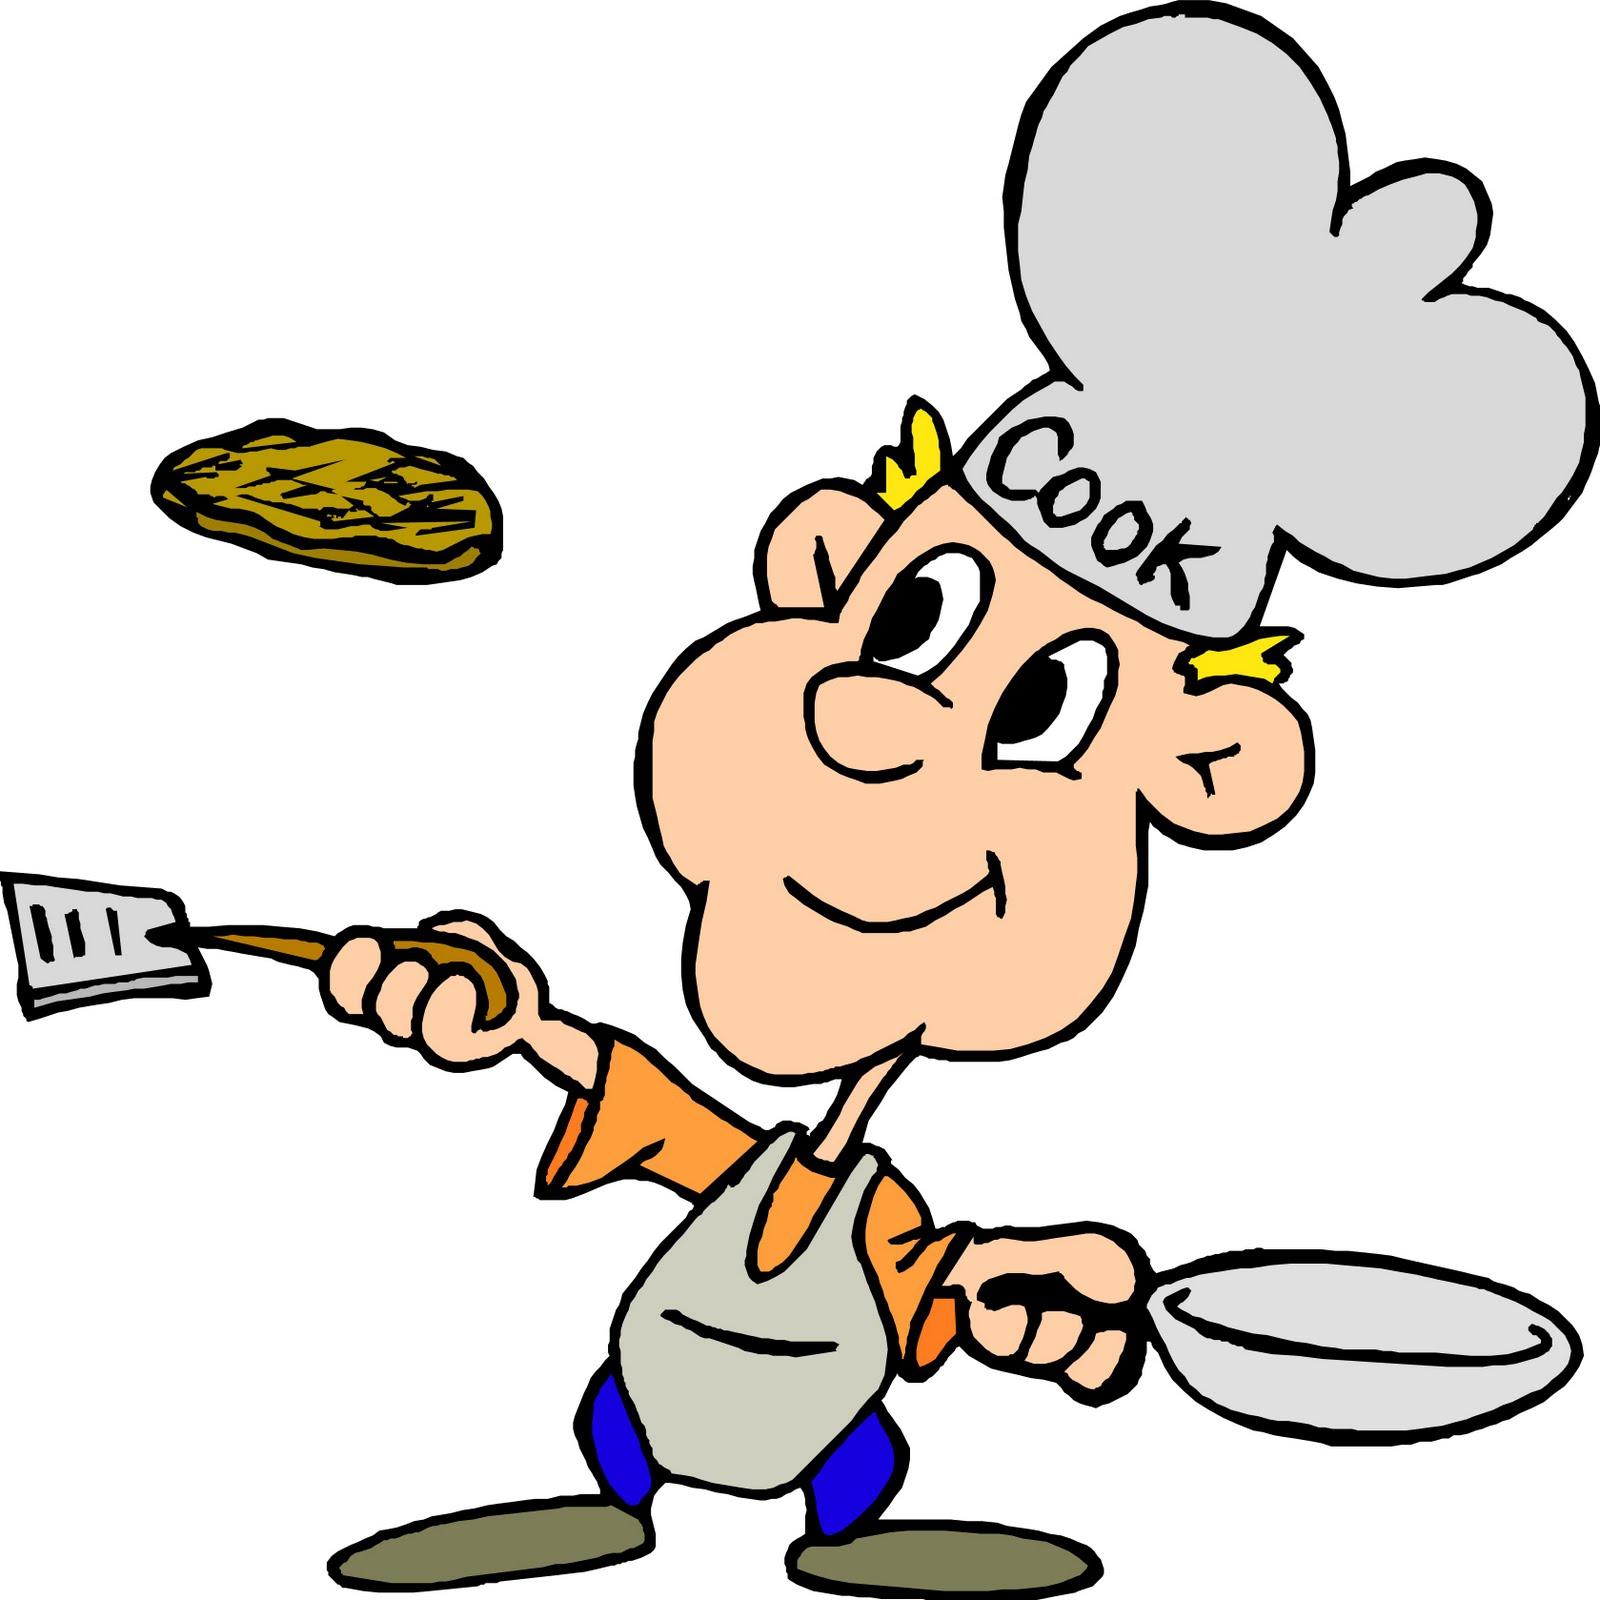 c9ecd794f527a6f8bfafeec16ea5e5f6_breakfast-elementary-school-cook-clipart_1600-1600.jpeg